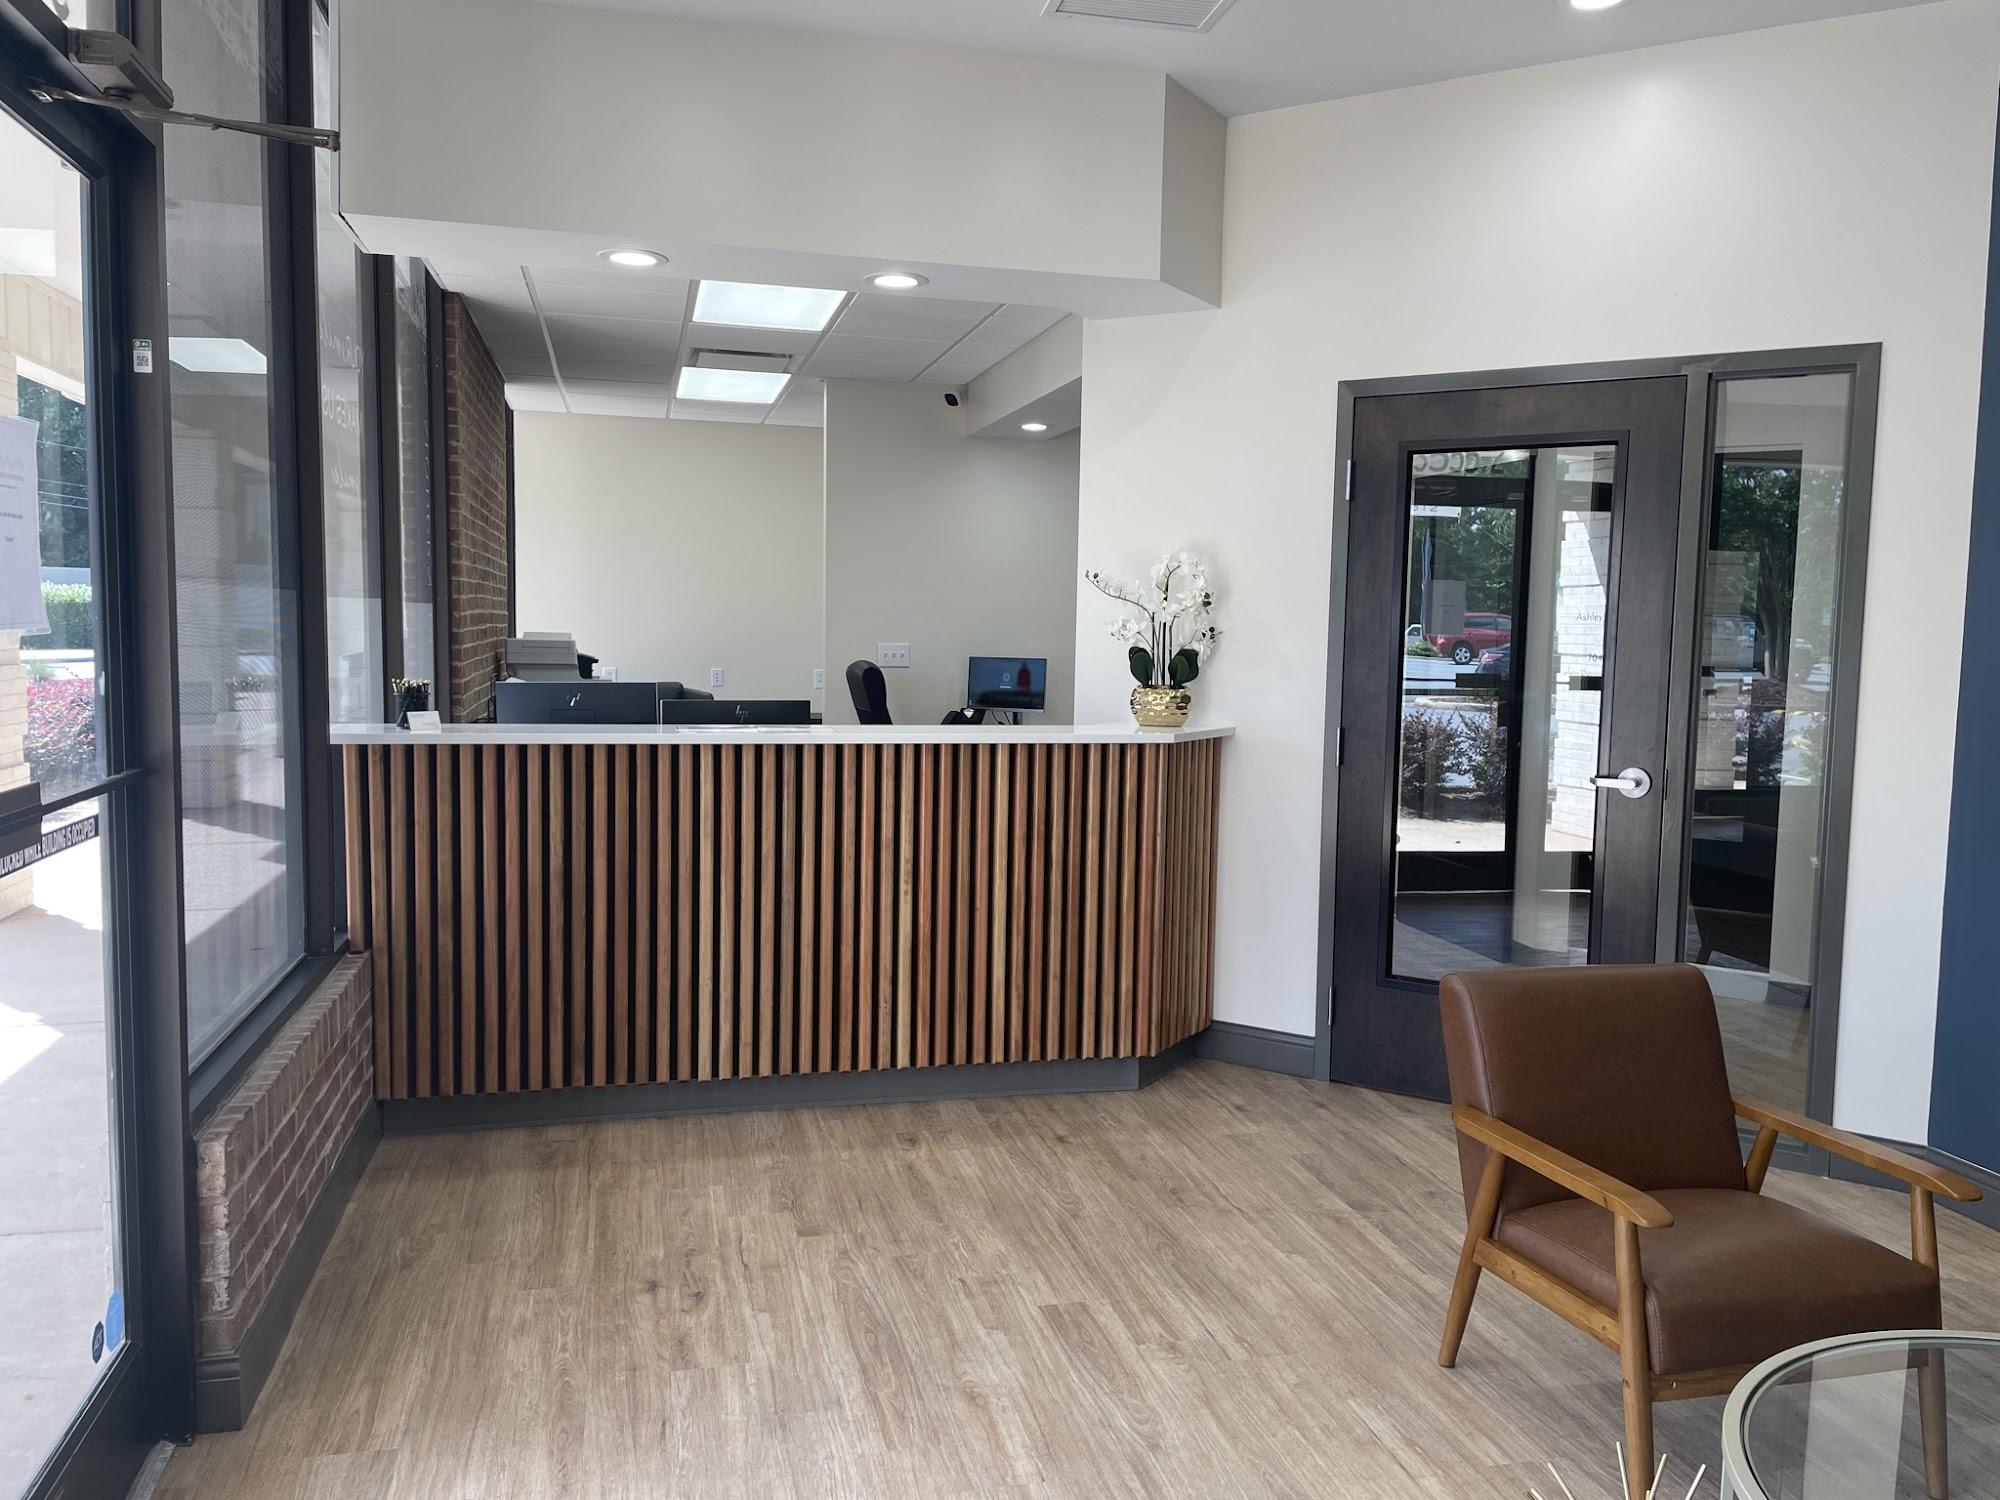 Dawson Modern Dentistry 3555-2 Matthews-Mint Hill Rd, Matthews